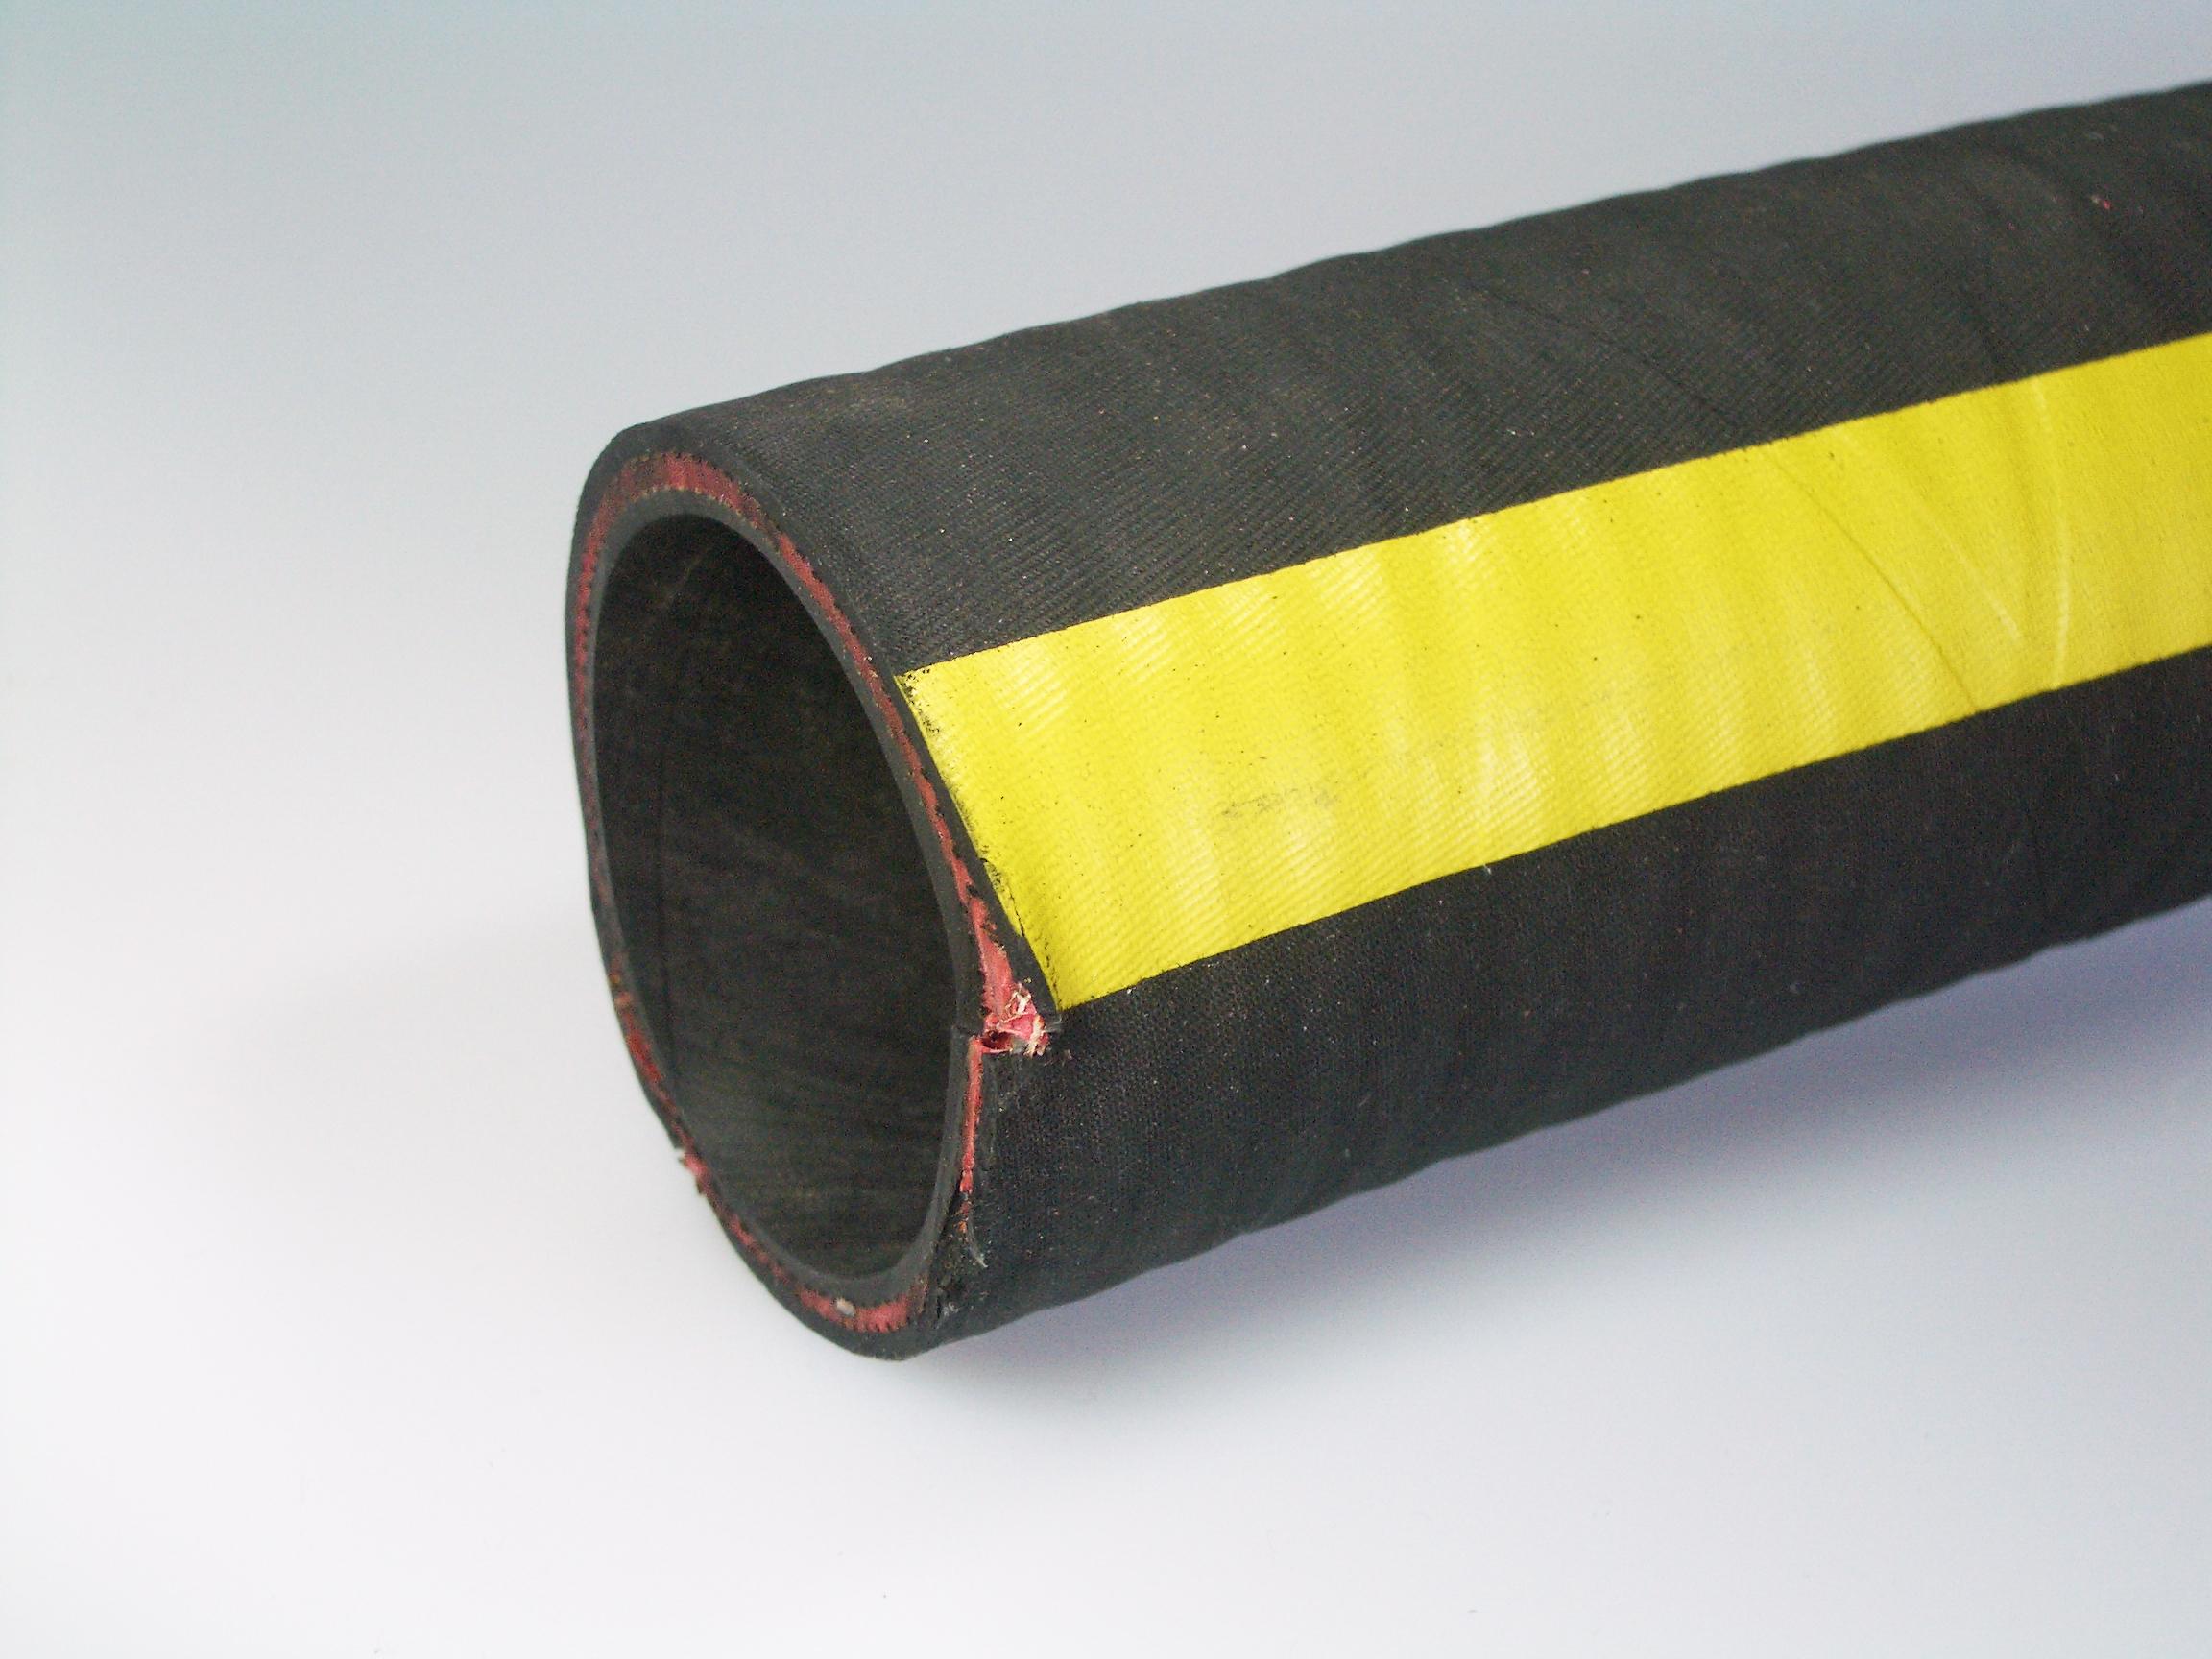 gummi saugschlauch deltaflex oil peter hefti ag. Black Bedroom Furniture Sets. Home Design Ideas